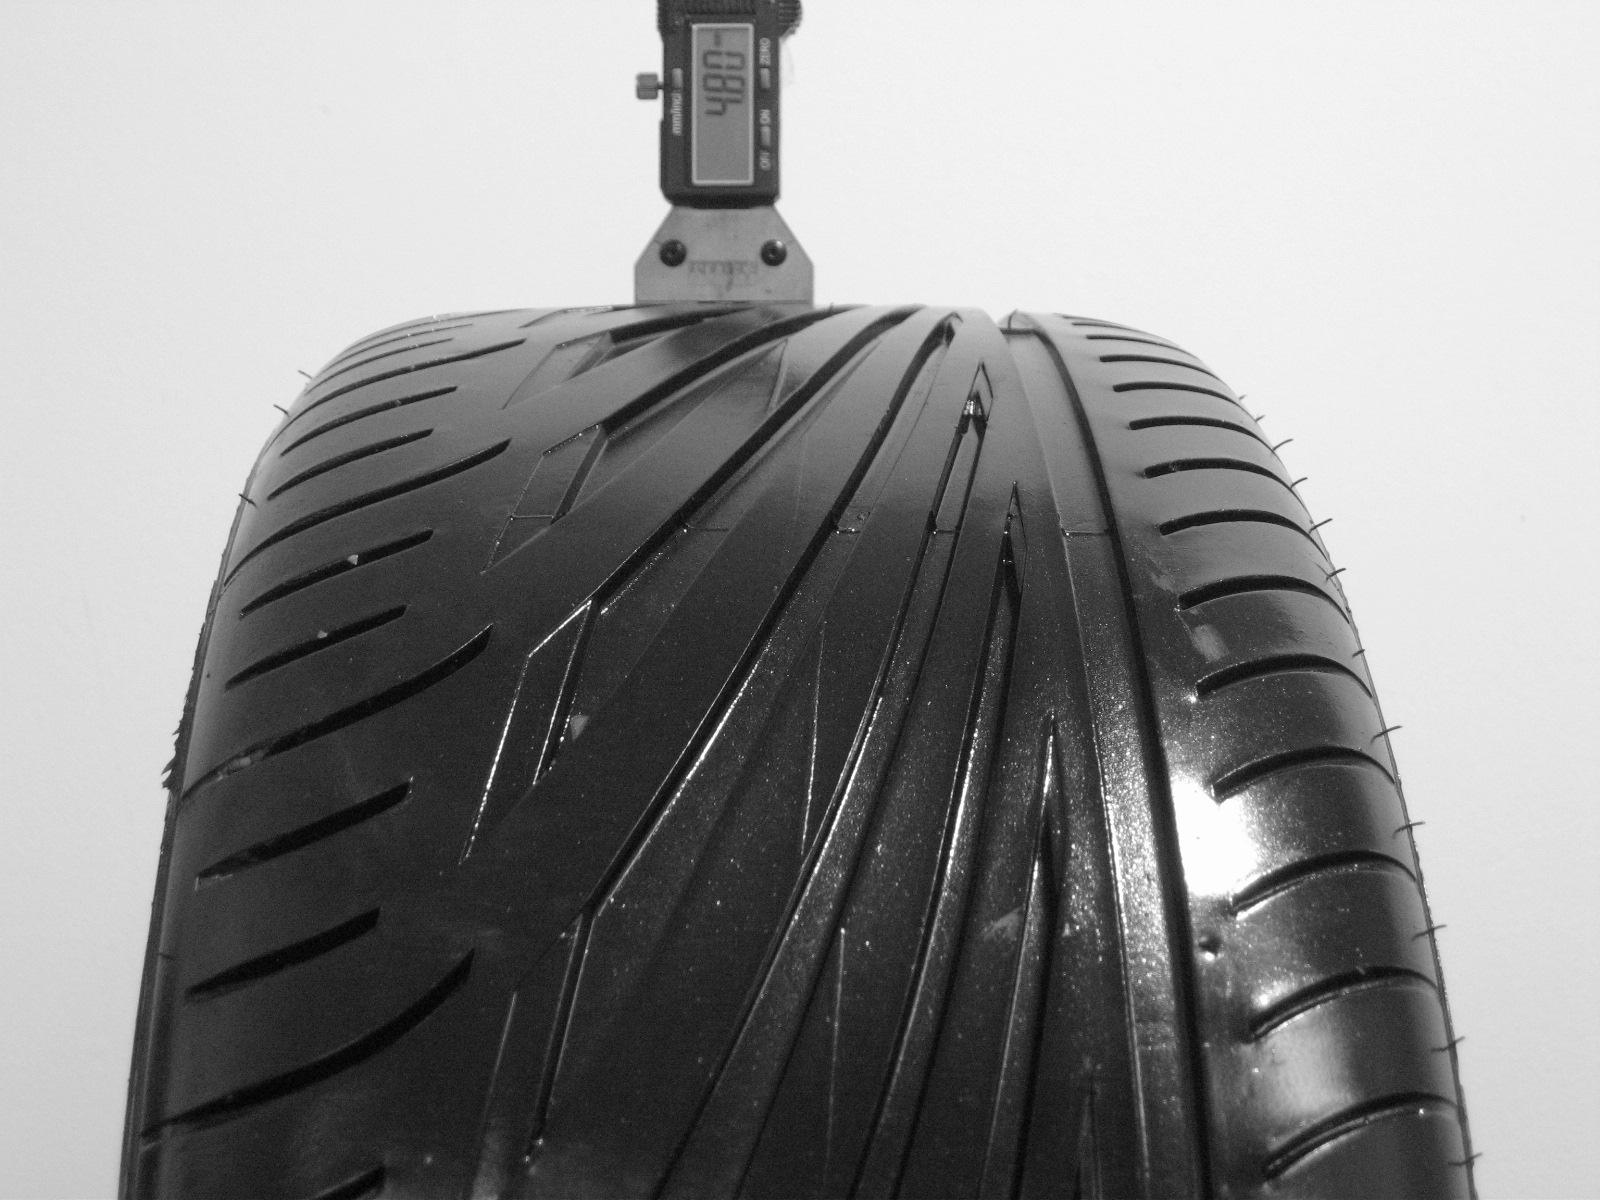 Použité-Pneu-Bazar - 225/40 R18 VREDESTEIN ULTRAC-SESSANTA-kusovka-rezerva 3mm